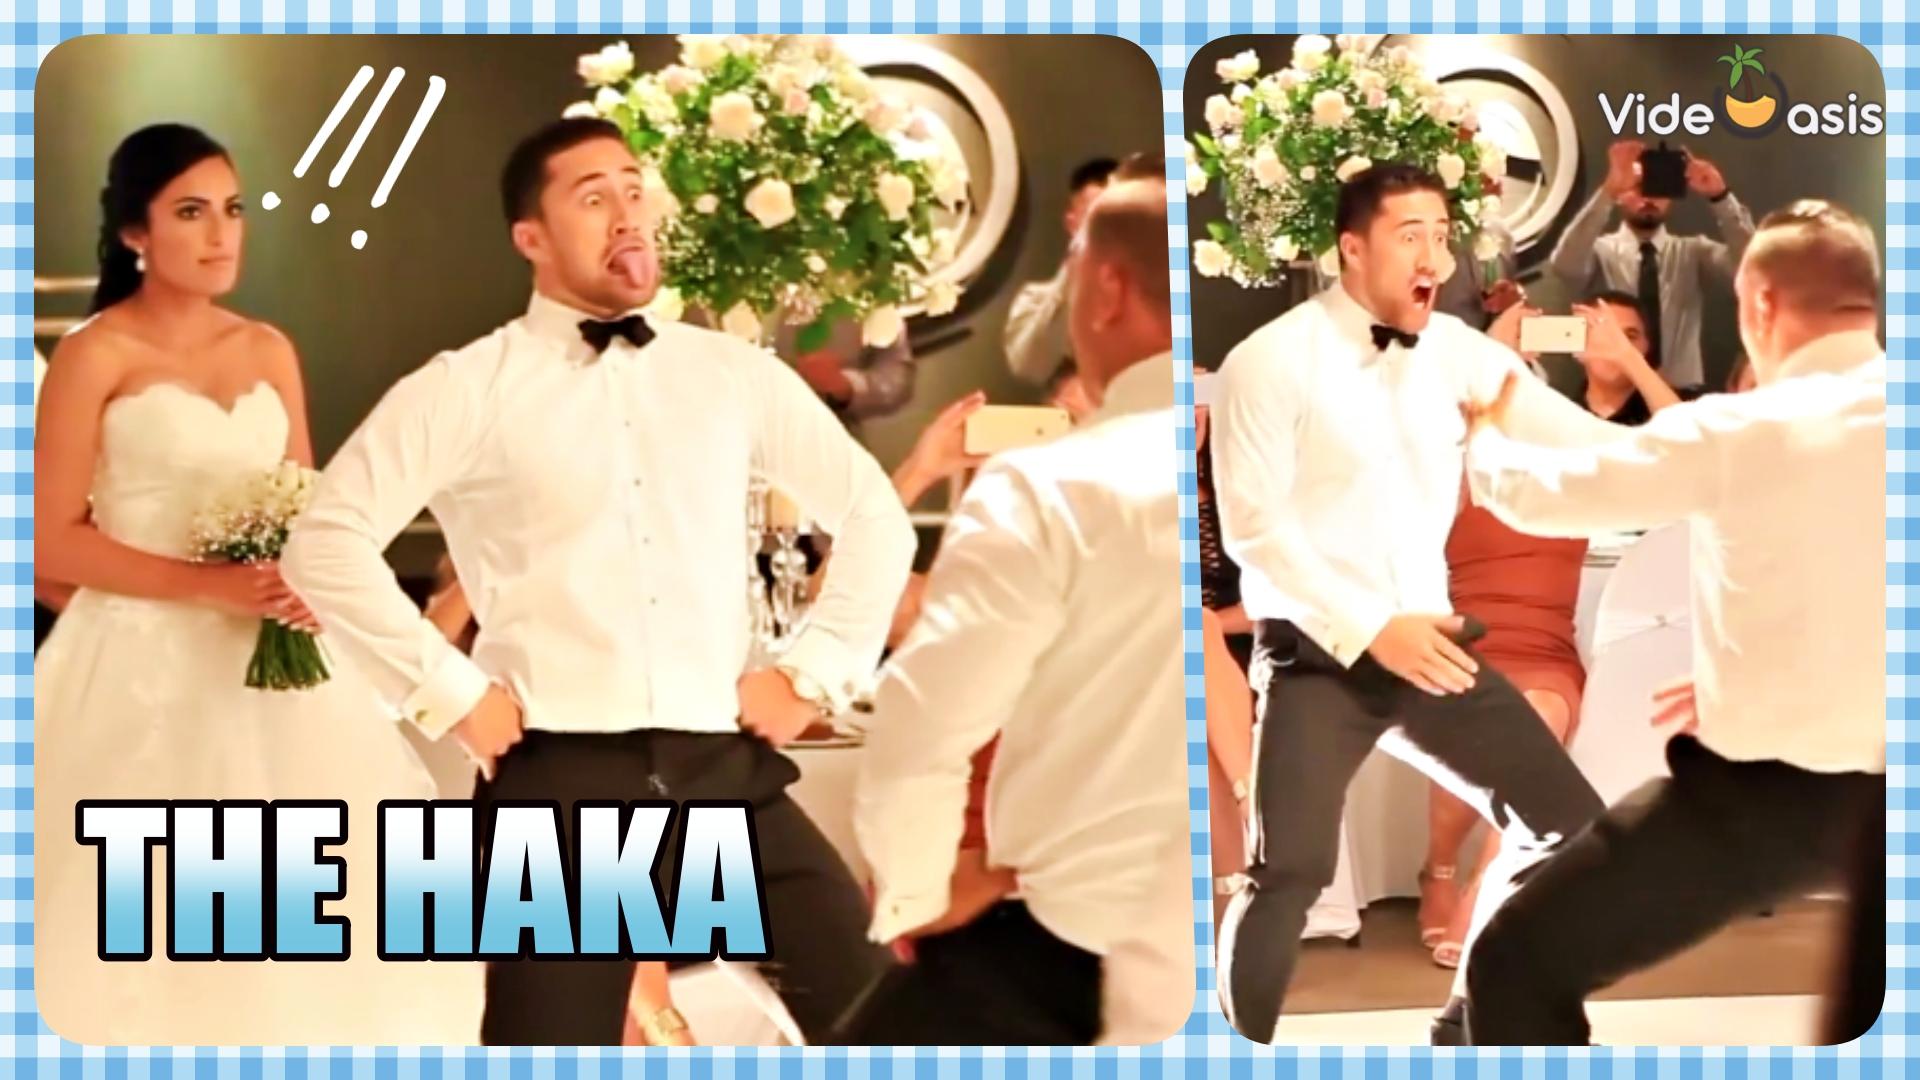 Haka Dance in Wedding Party | VideOasis